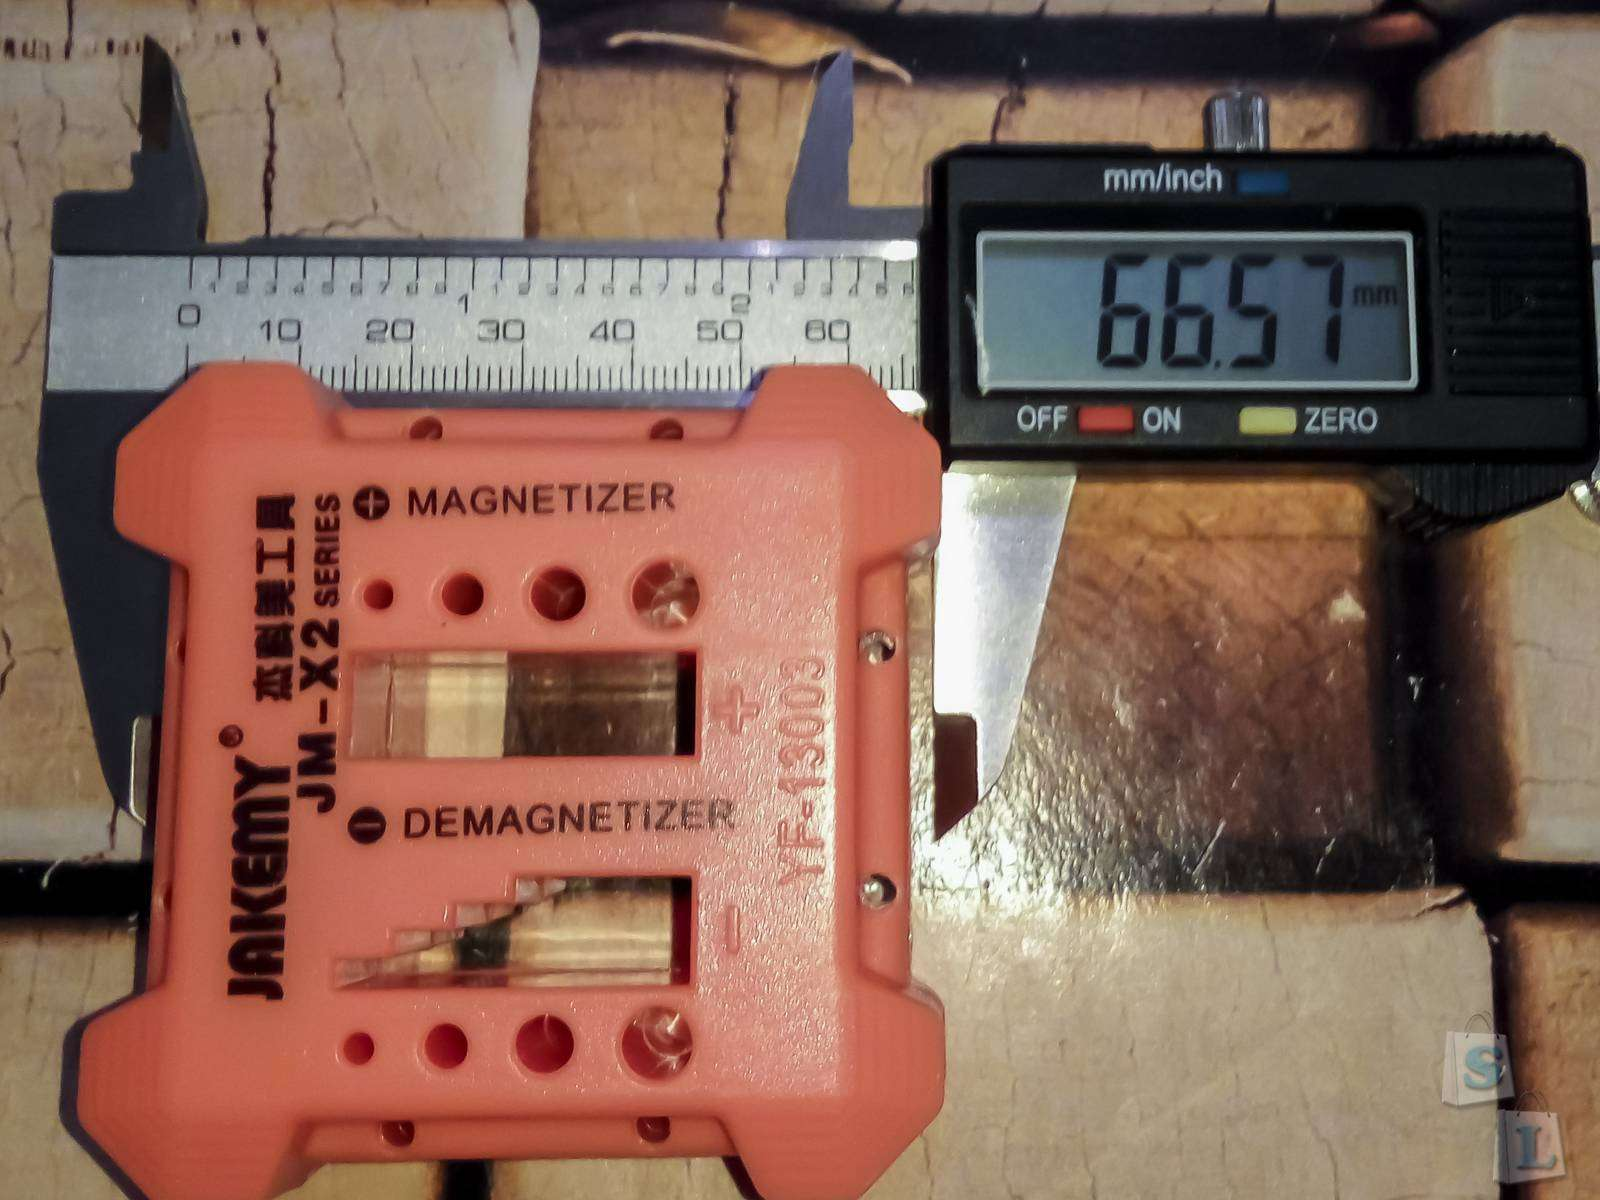 GearBest: Магнетизатор - демагнетизатор JAKEMY JM - X2